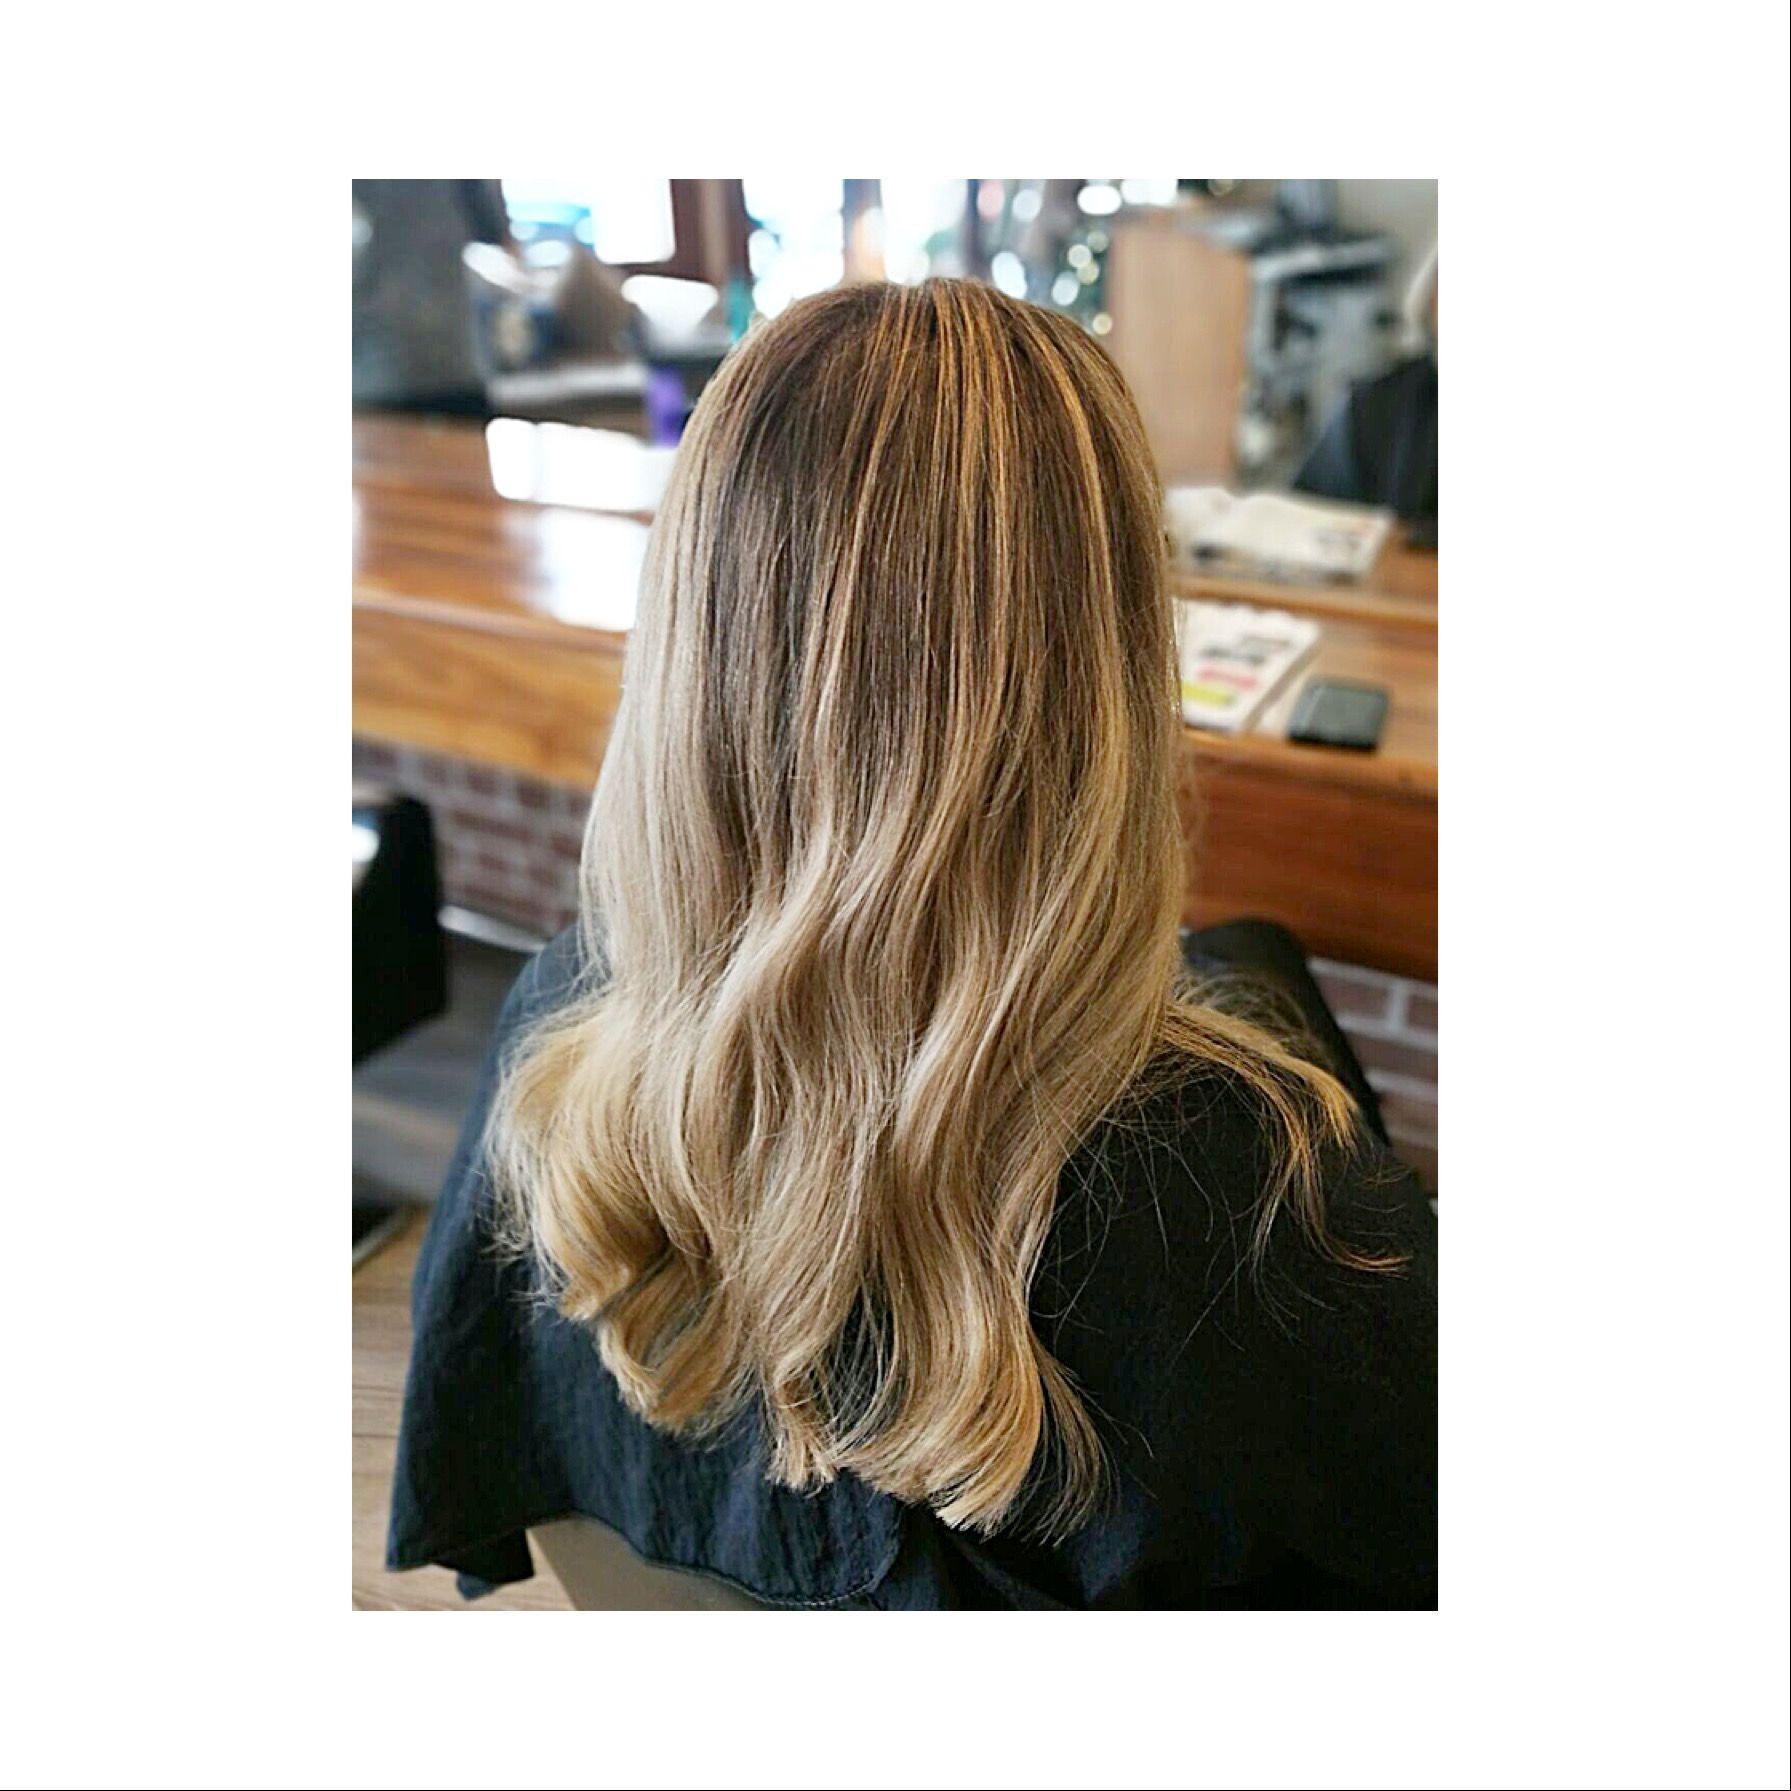 Creamy Blonde Melts By Kerrie Creamy Blonde Long Hair Styles Hair Styles